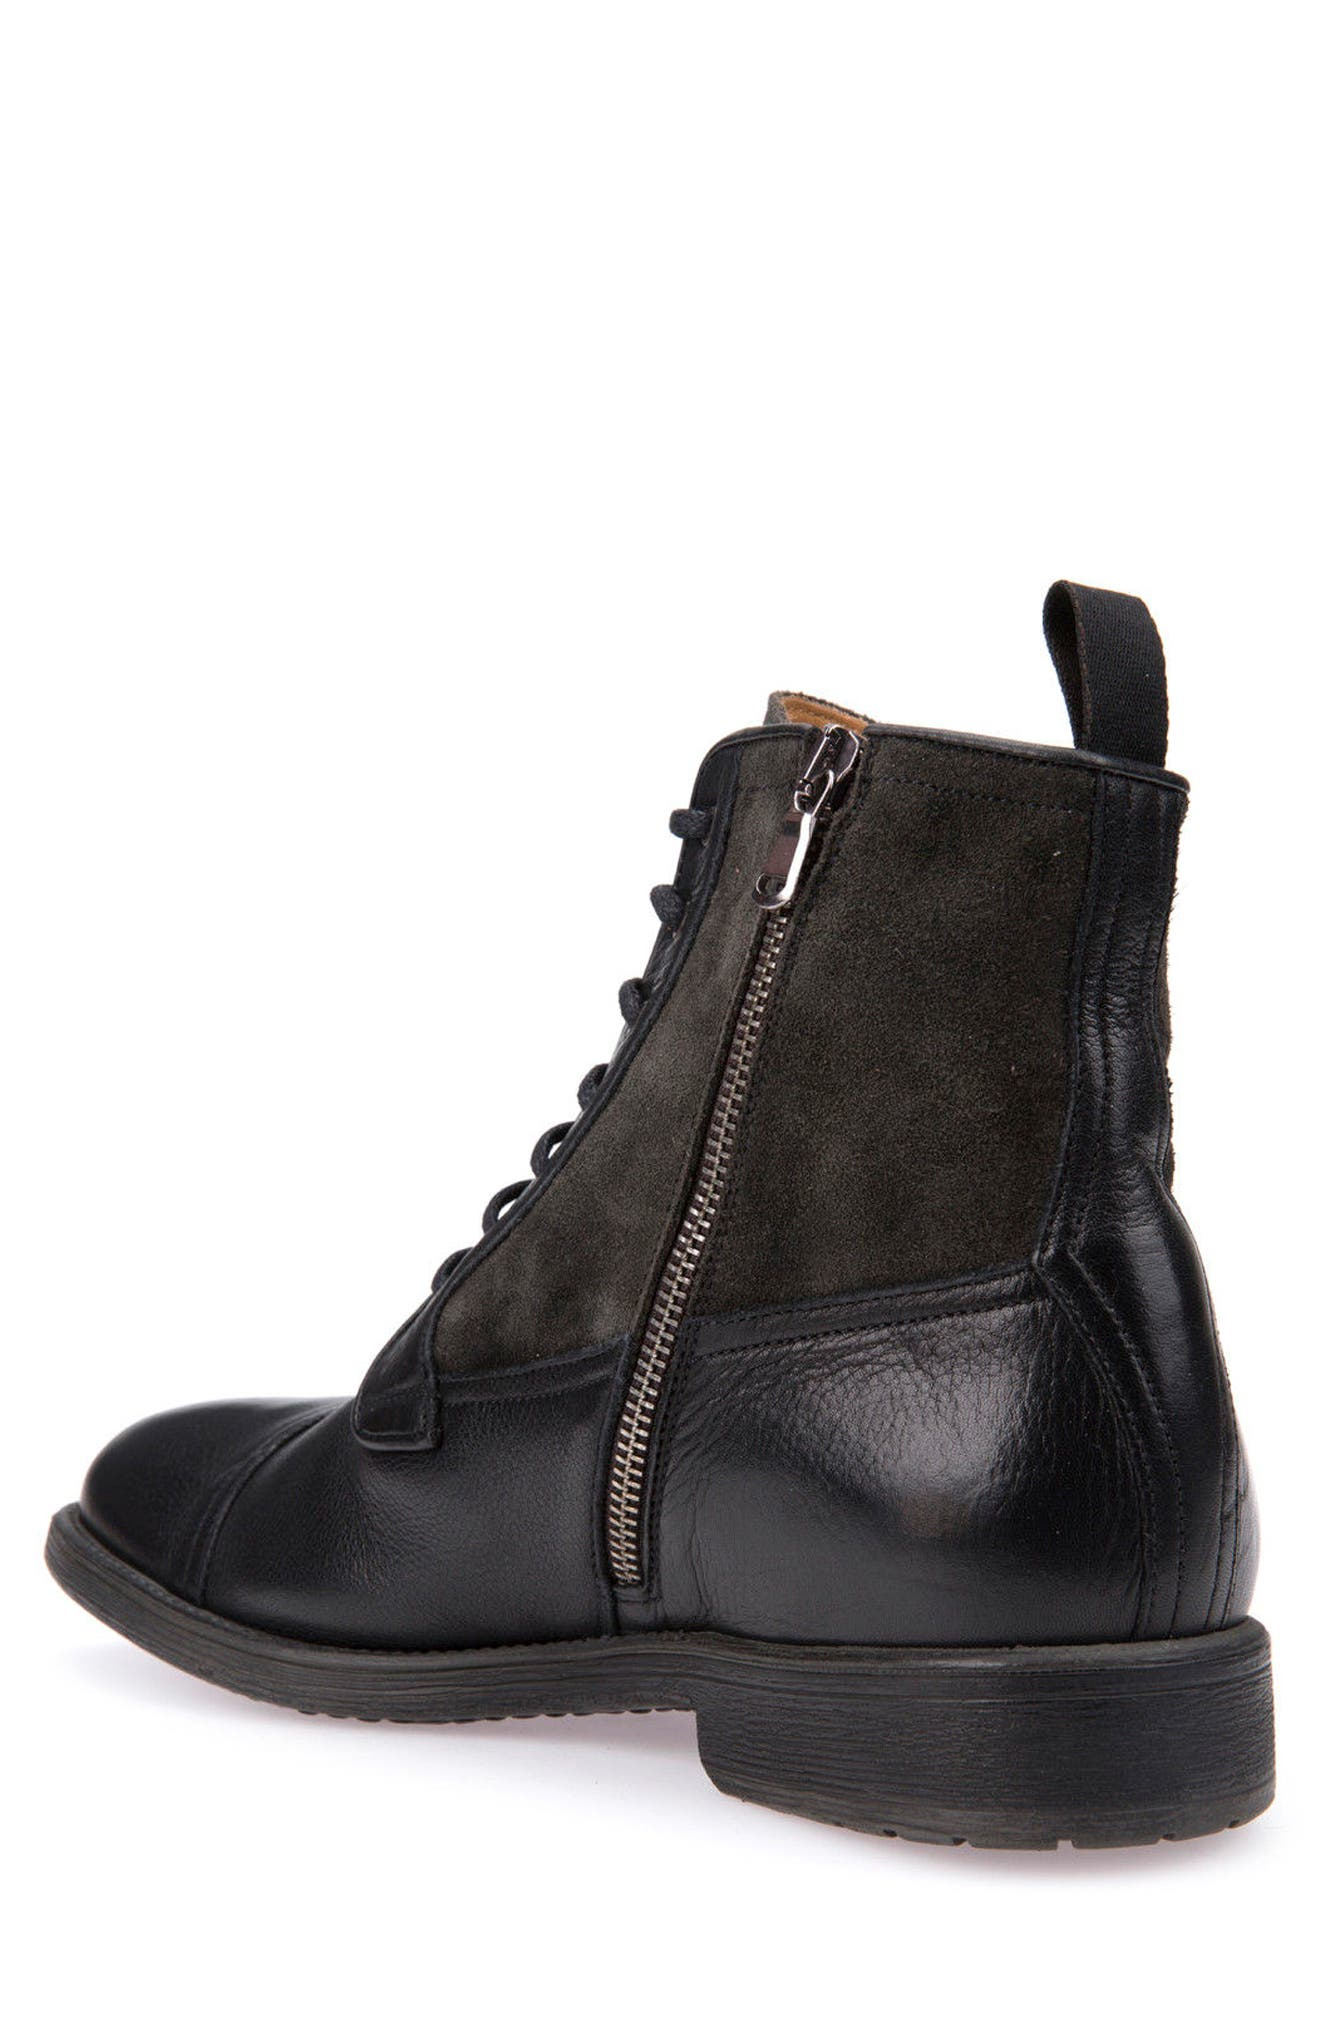 Jaylon 12 Cap-Toe Boot,                             Alternate thumbnail 2, color,                             001